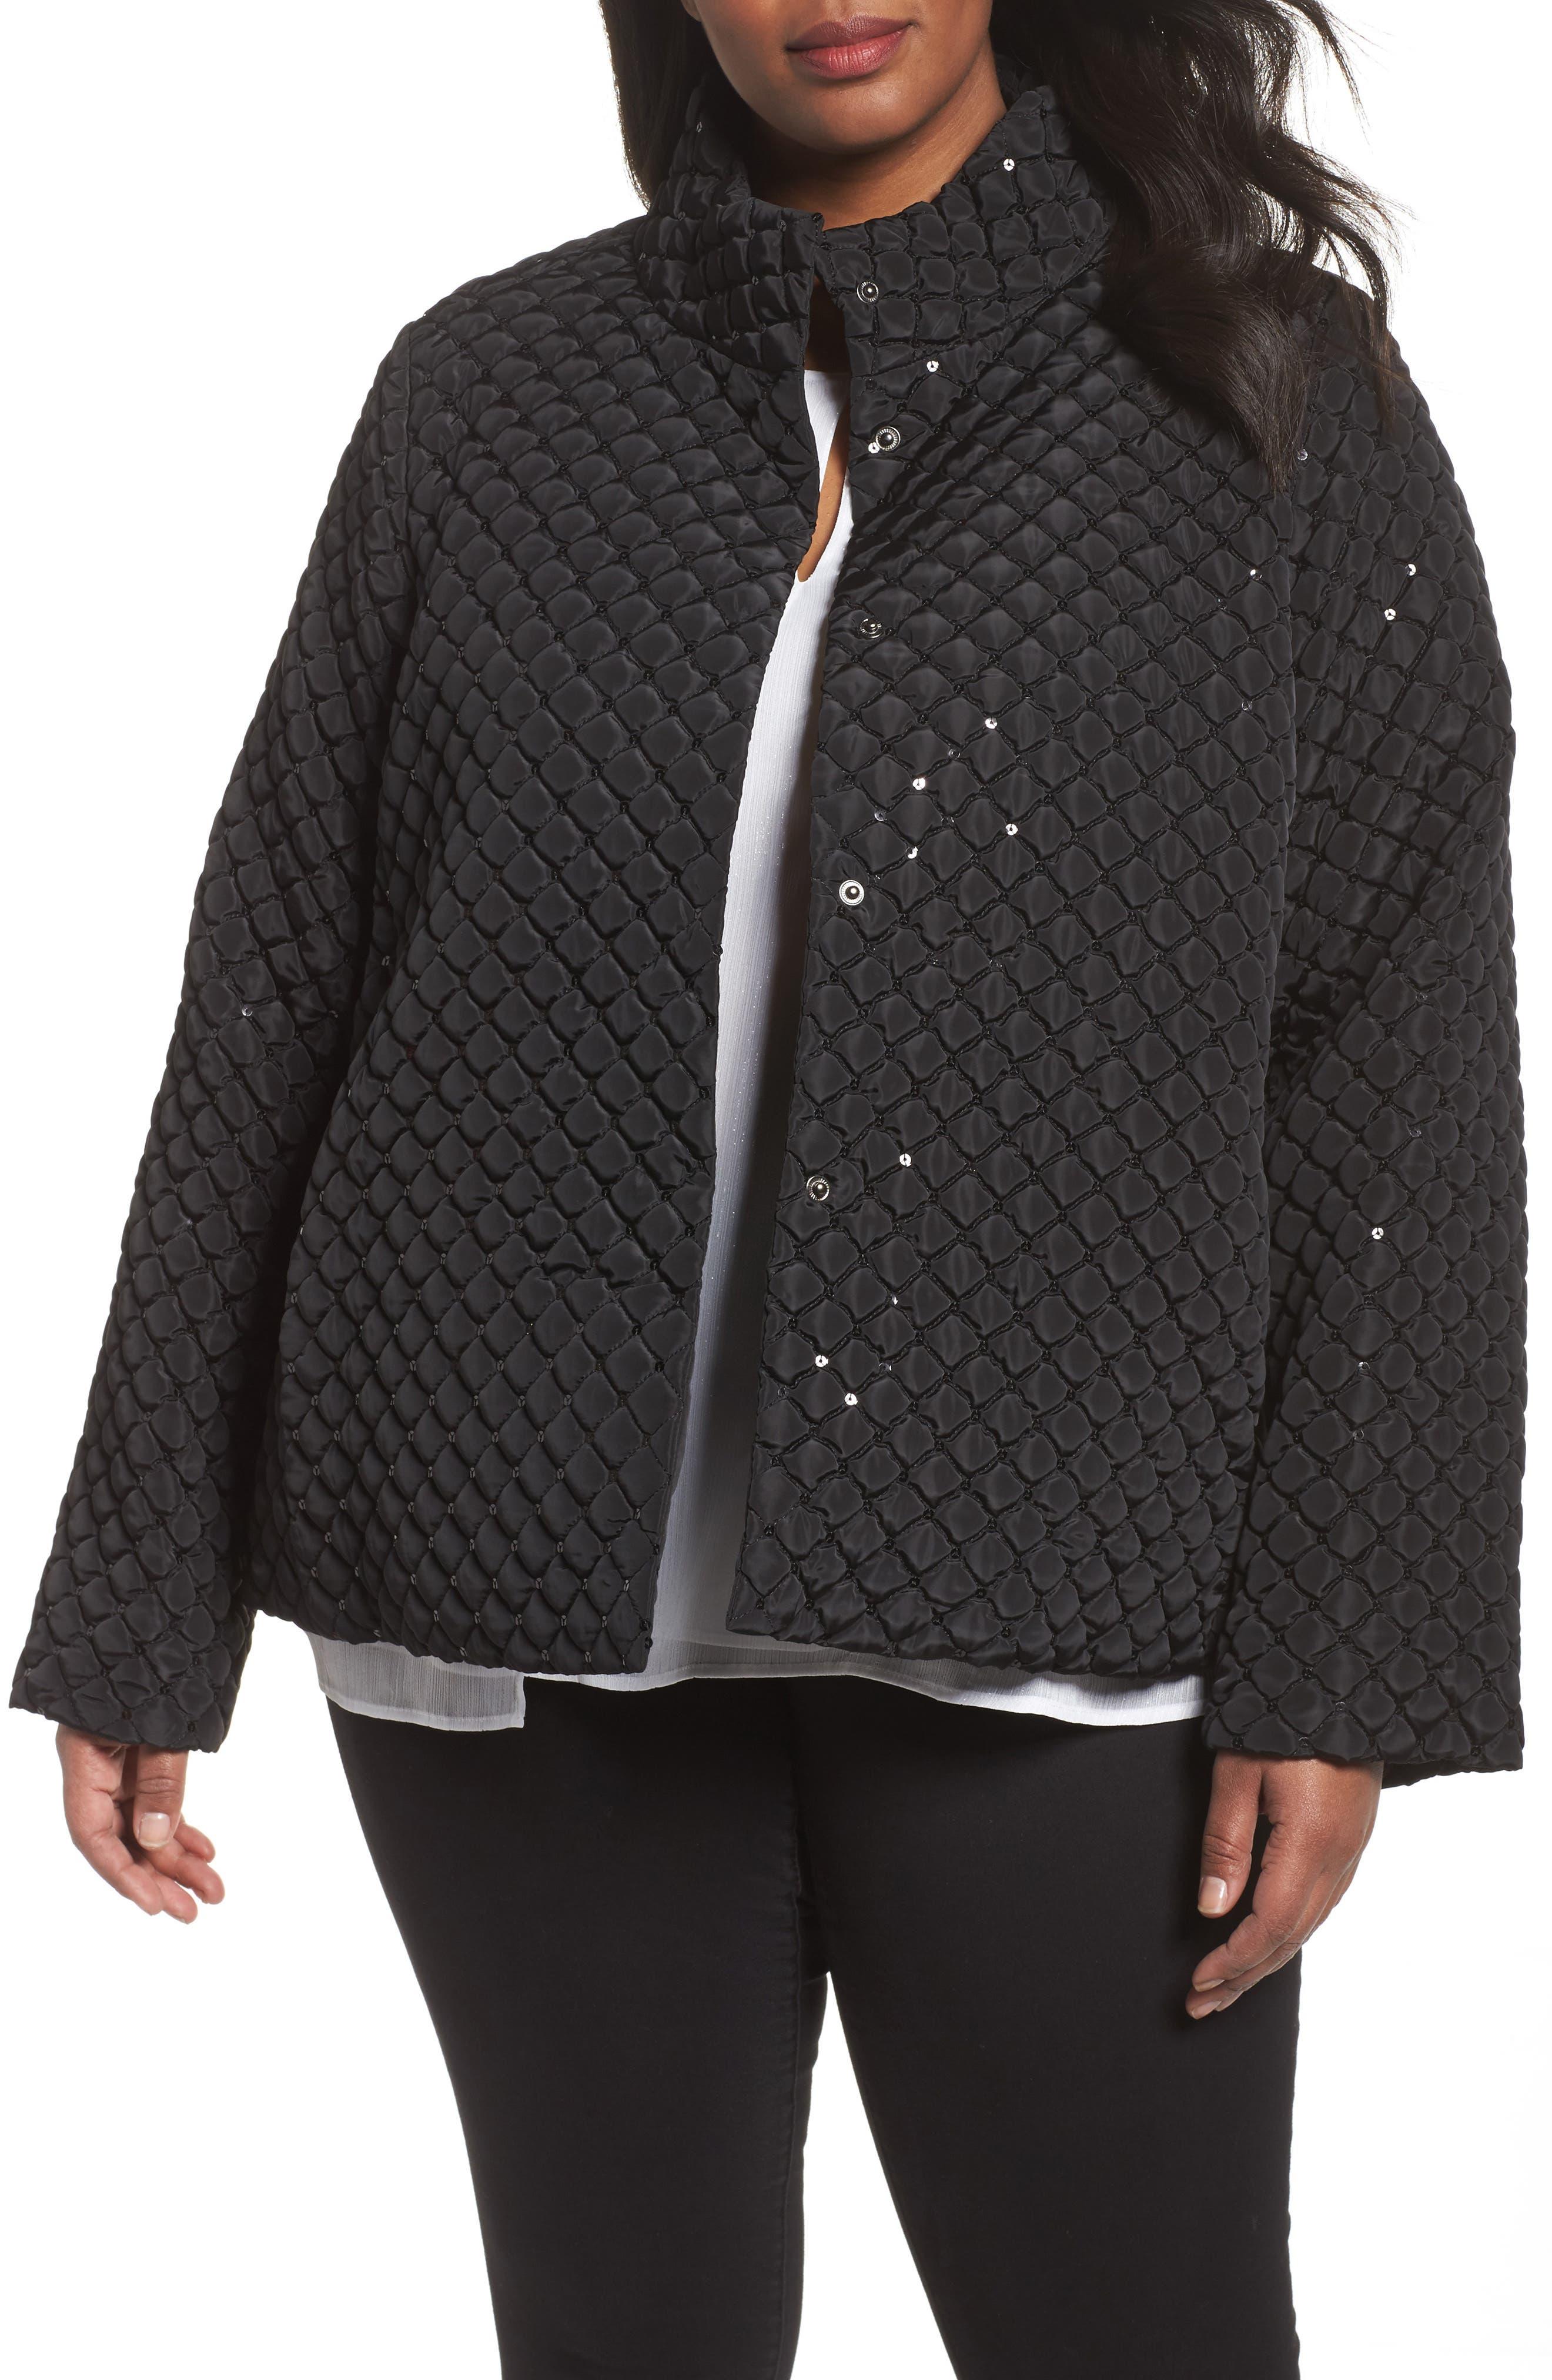 Papaia Sequin Jacket,                             Main thumbnail 1, color,                             001